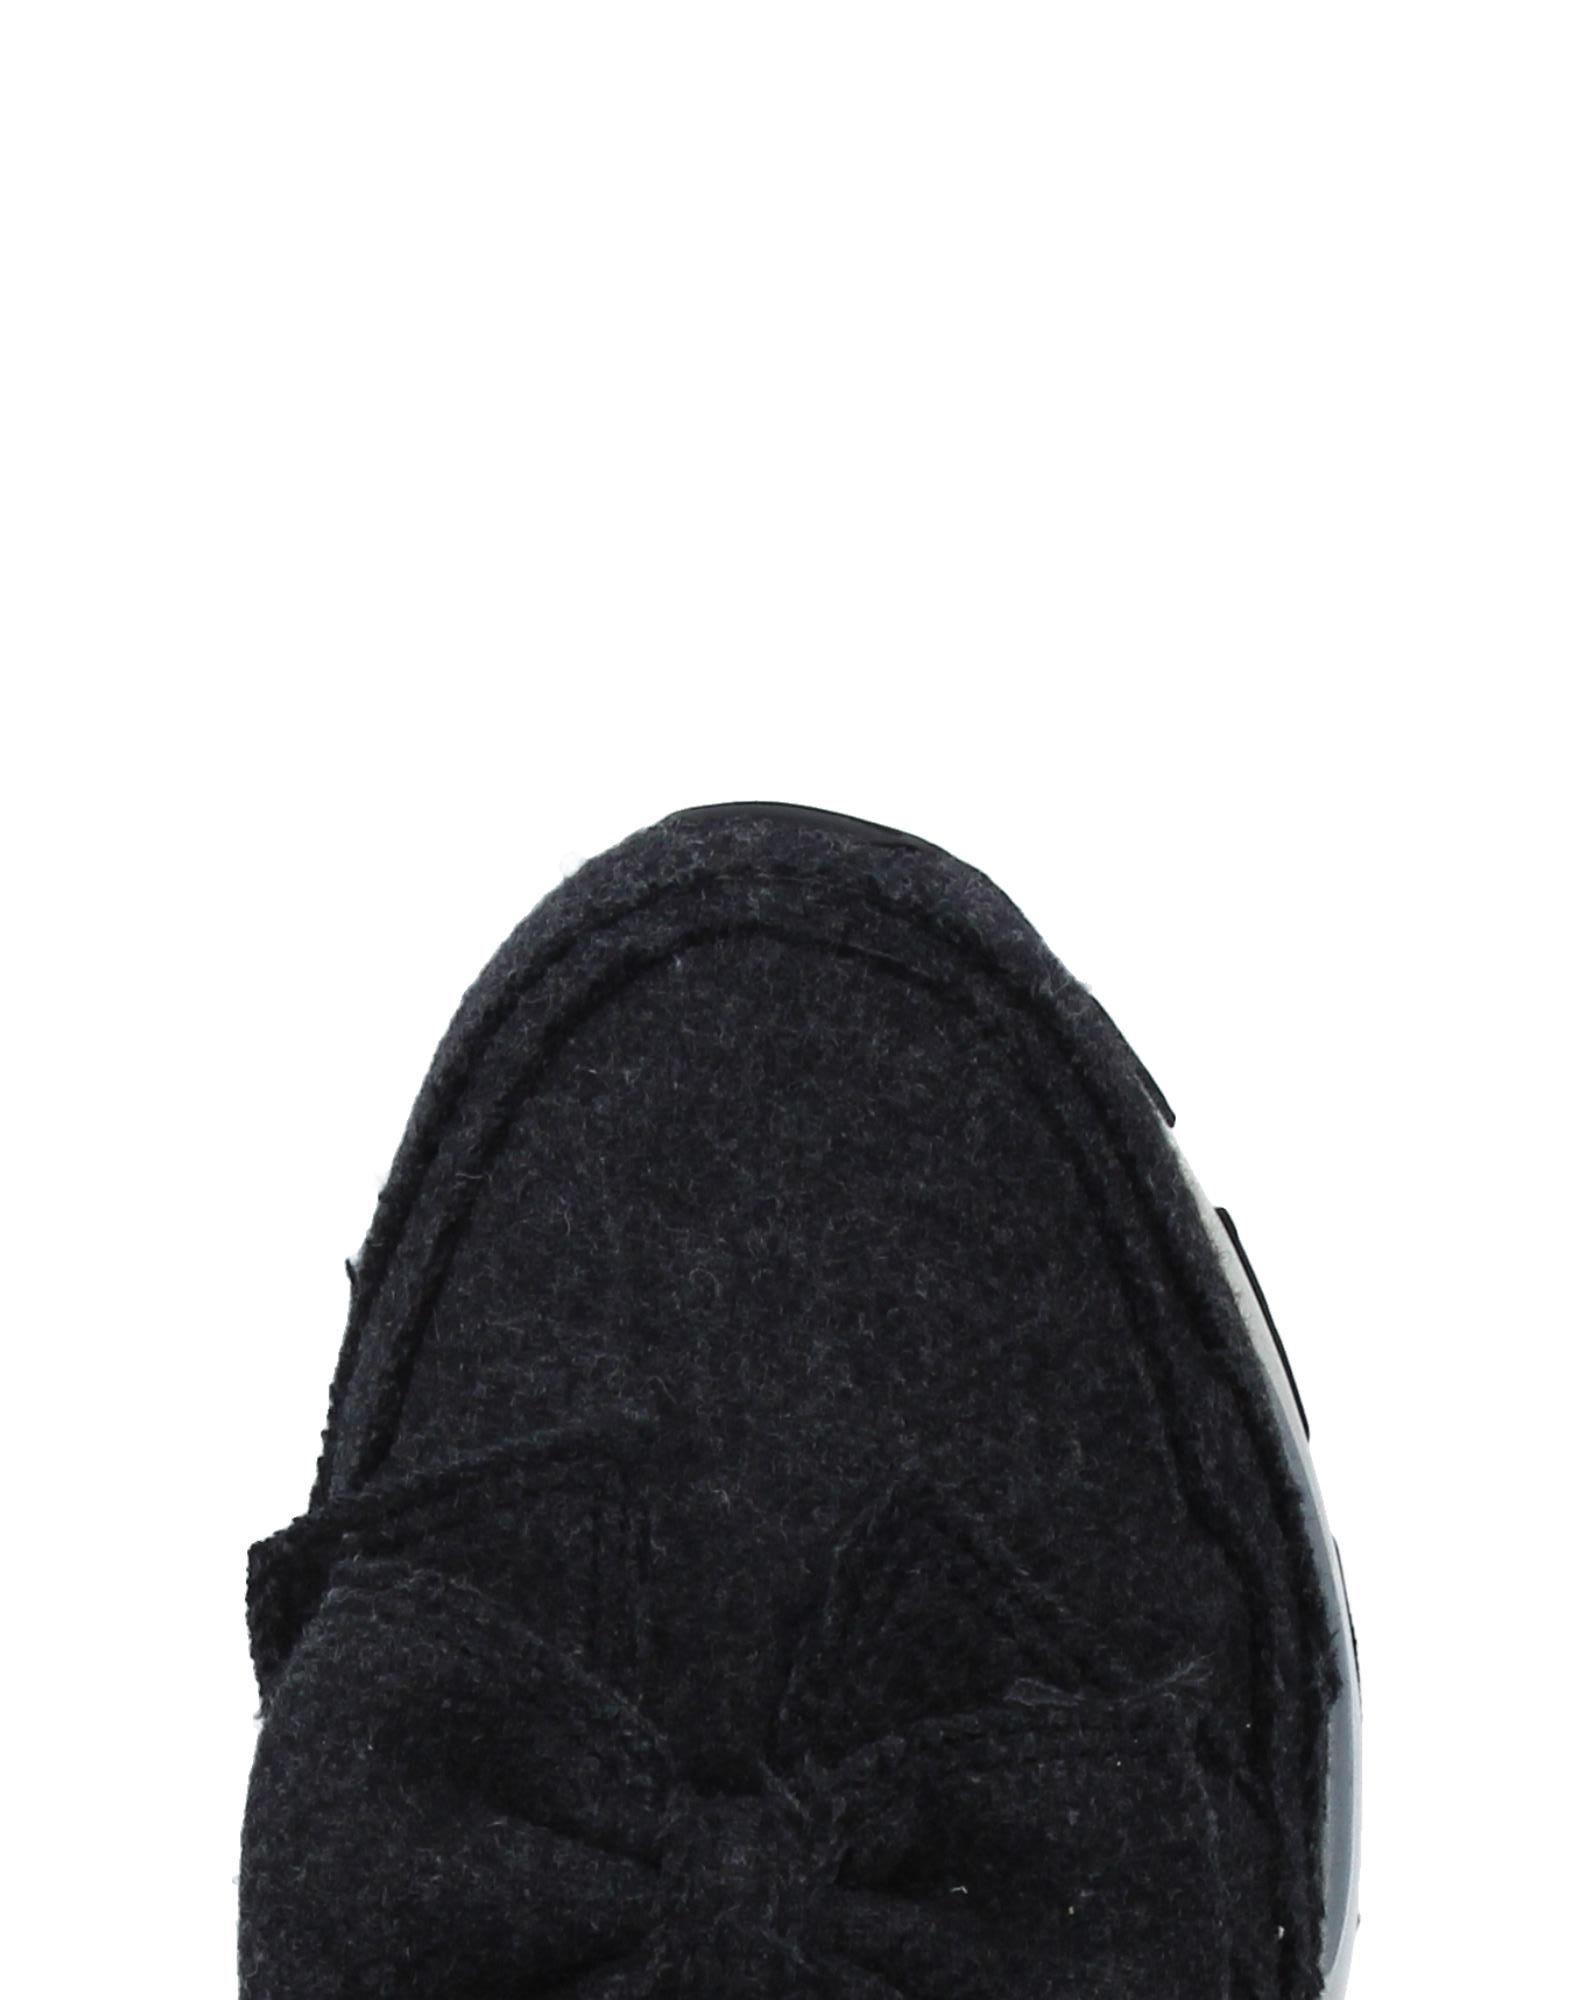 Suecomma Bonnie Flannel Low-tops & Sneakers in Lead (Black)